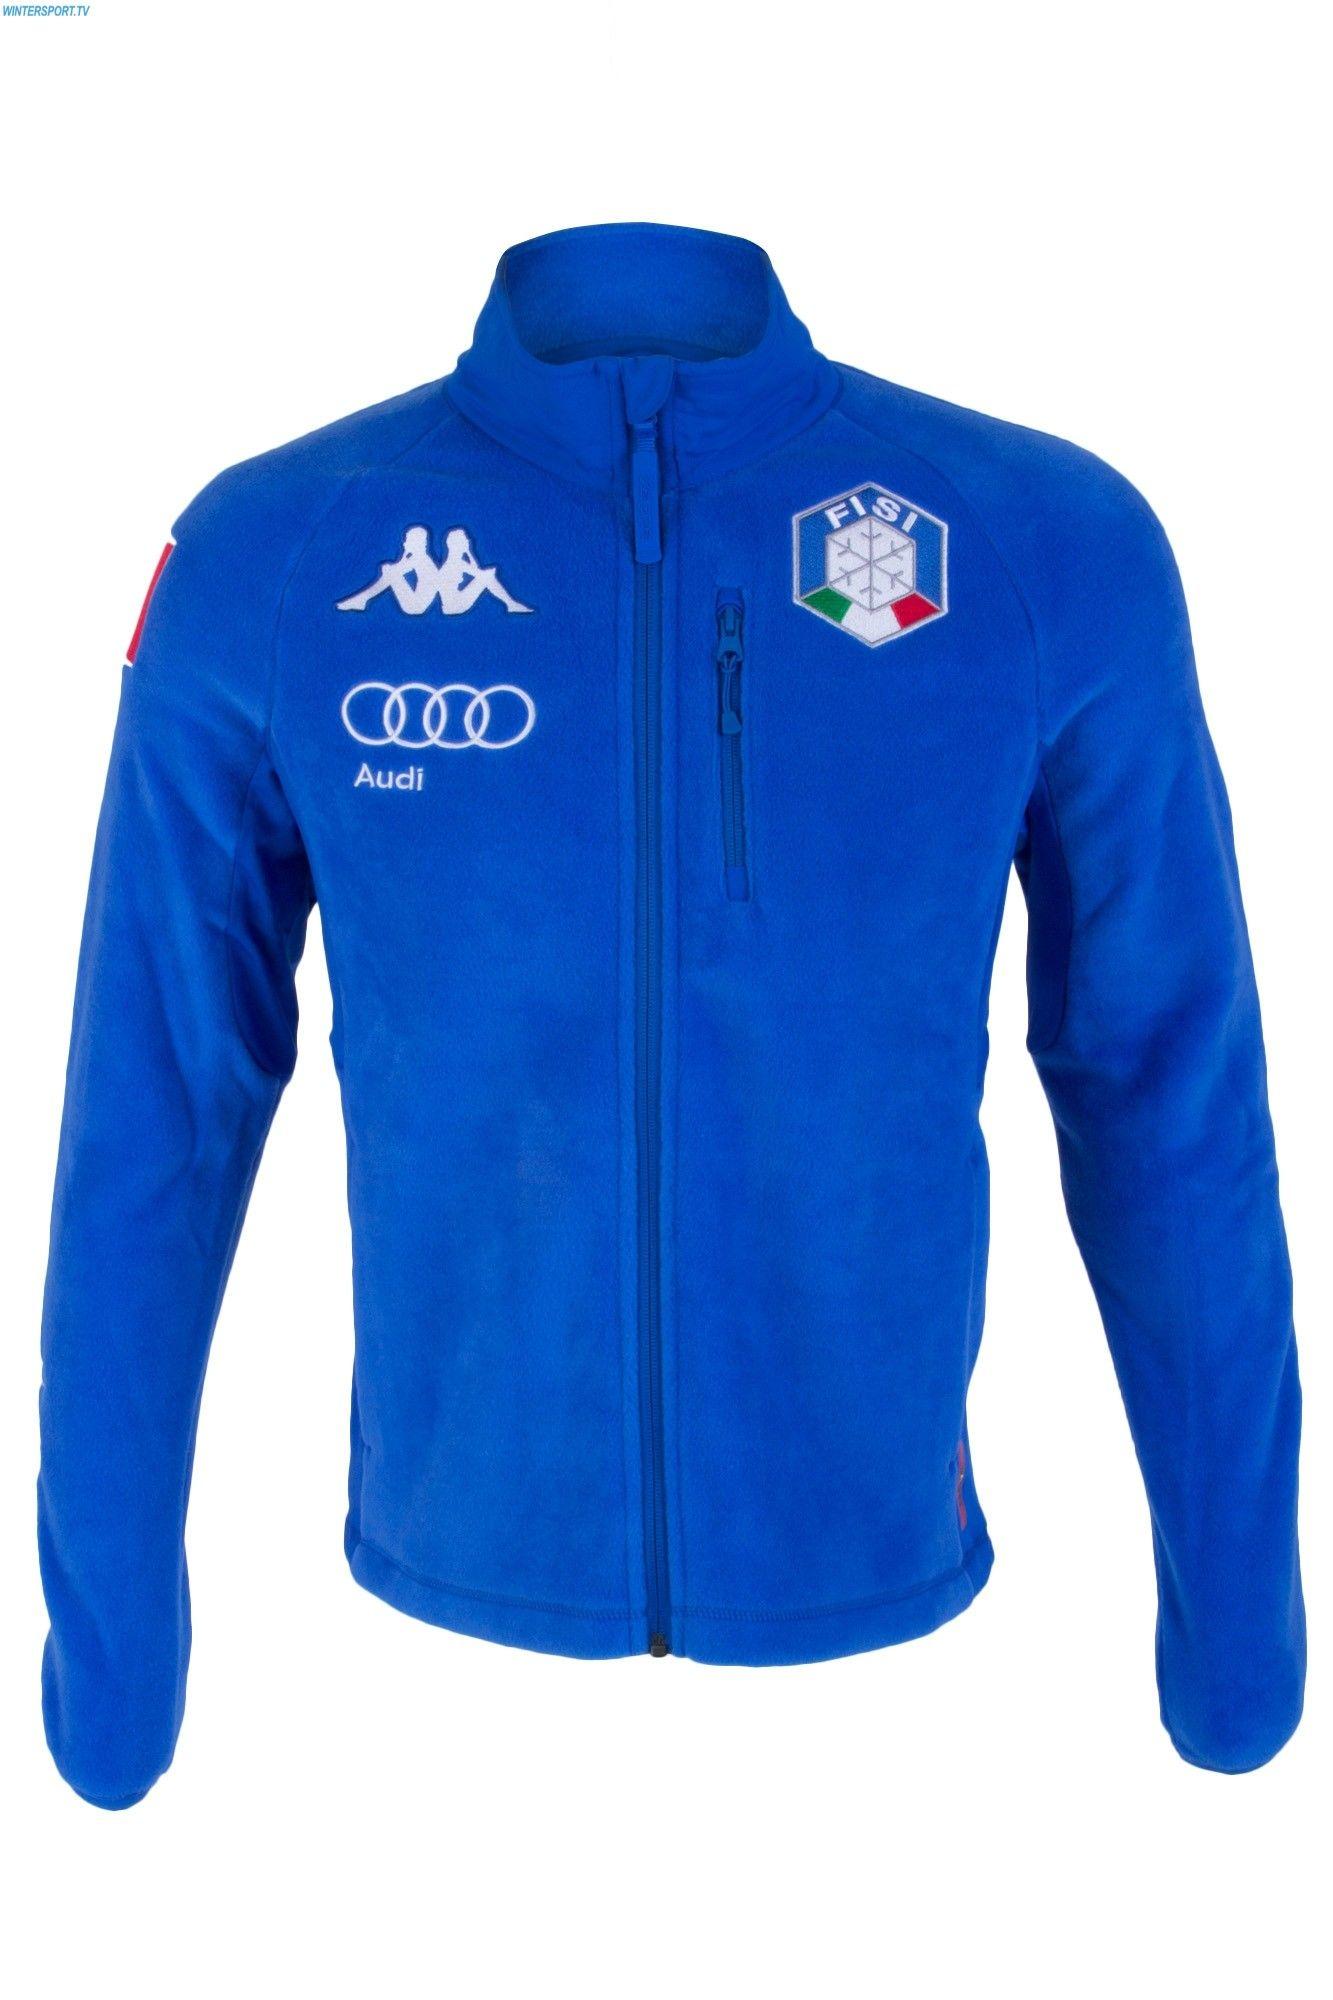 kappa men italian alpine team fisi fleece jacket blue princess  kappa men italian alpine team fisi fleece jacket blue princess white